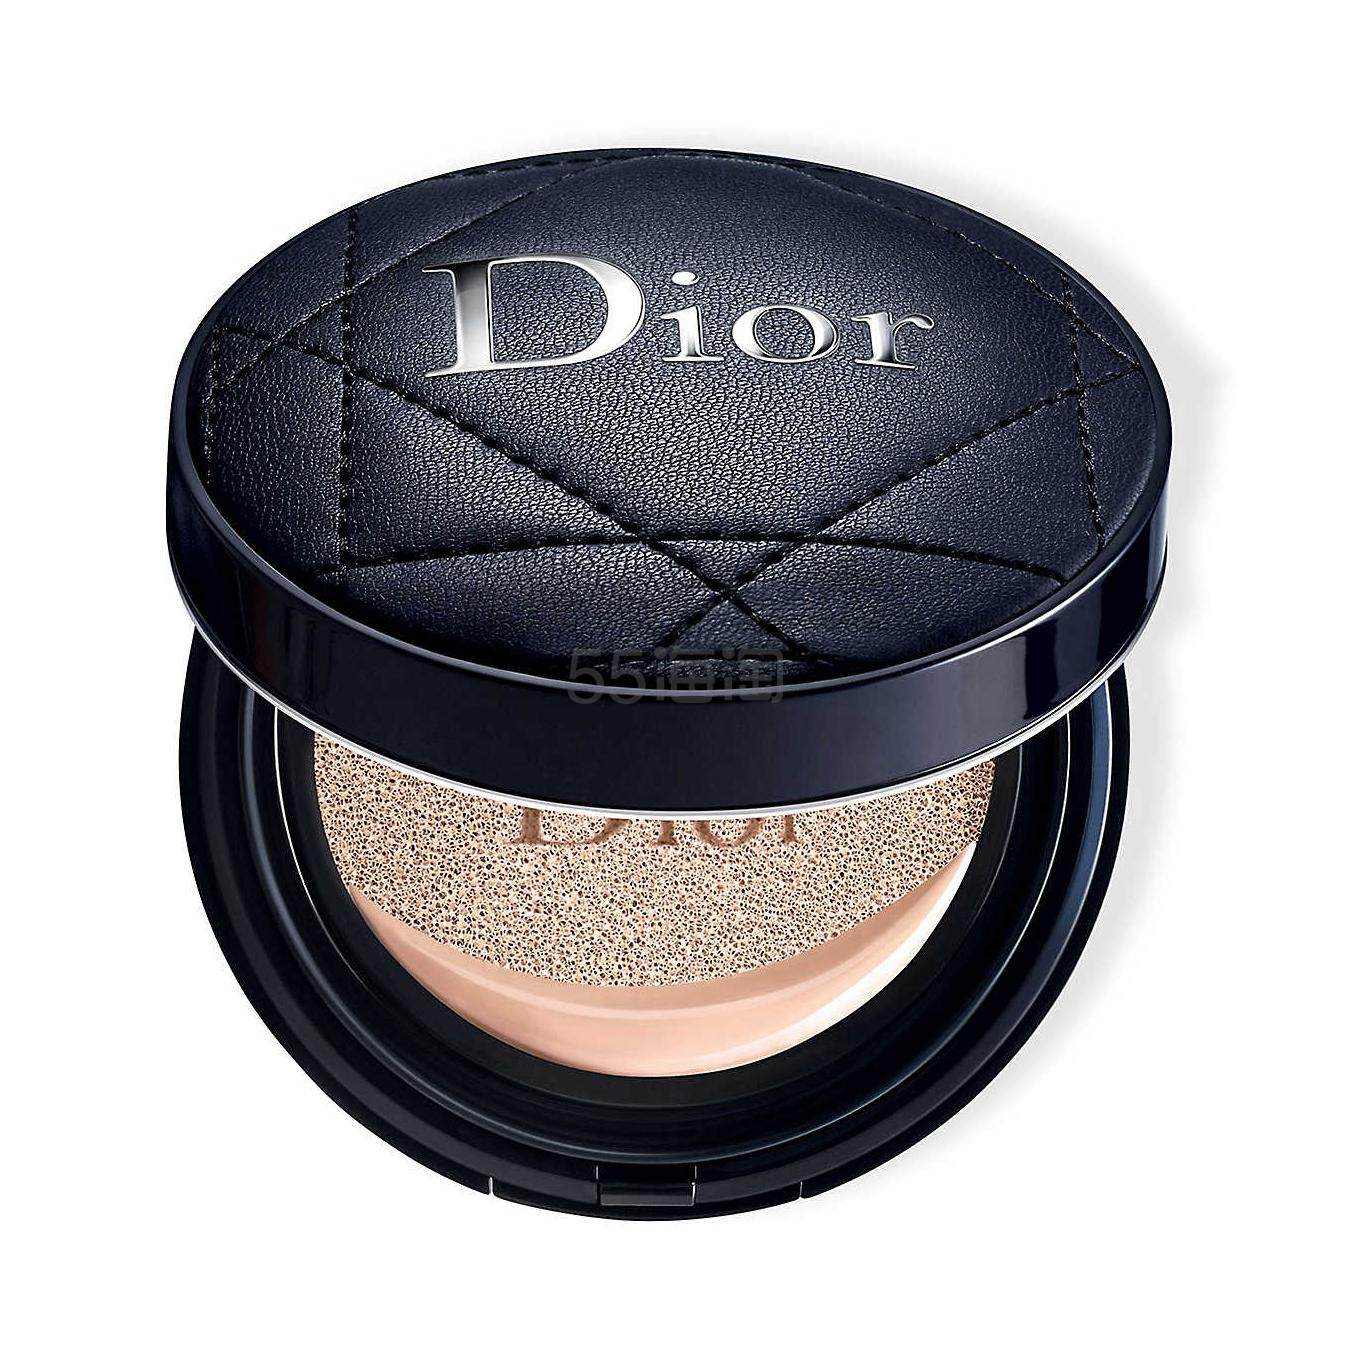 Dior 迪奥 皮革气垫 凝脂恒久气垫粉底 港币380(约348元) - 海淘优惠海淘折扣|55海淘网